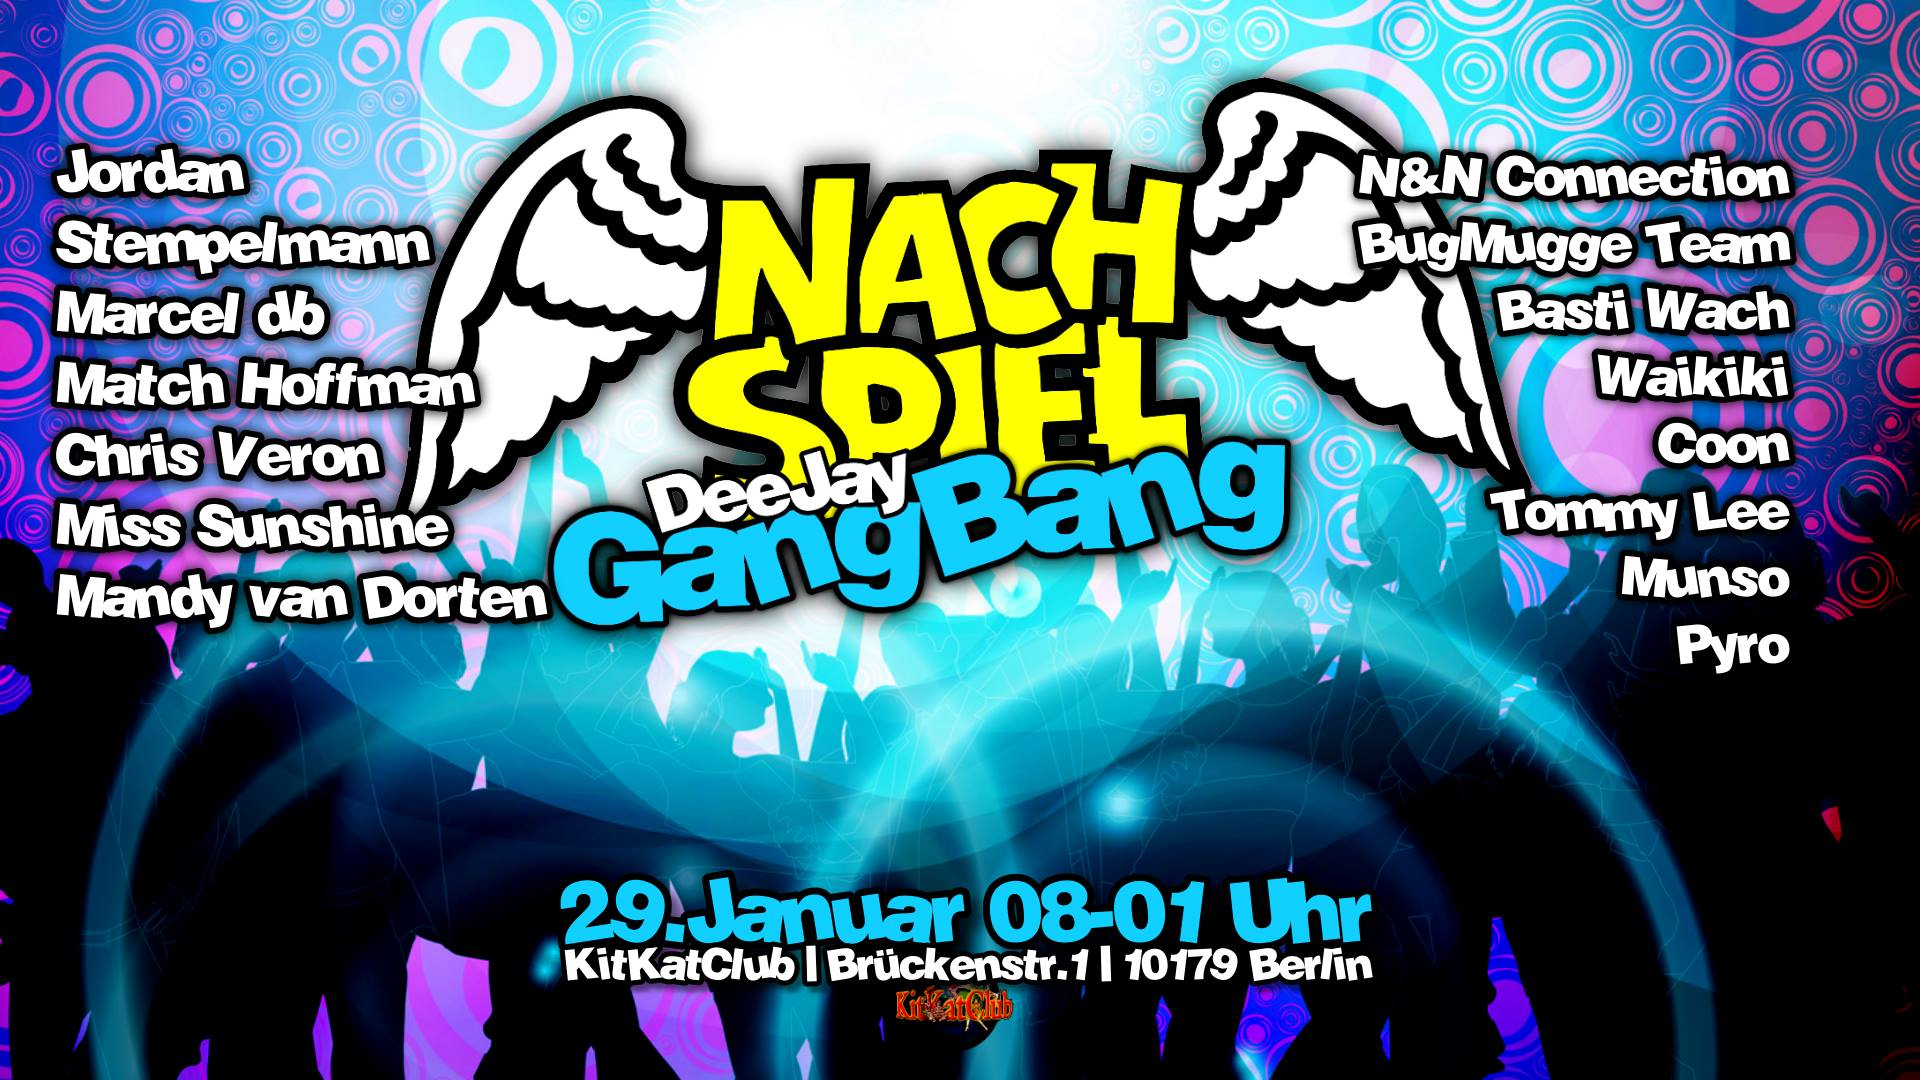 Marcel db & Munso live beim NachSpiel DeeJay GangBang